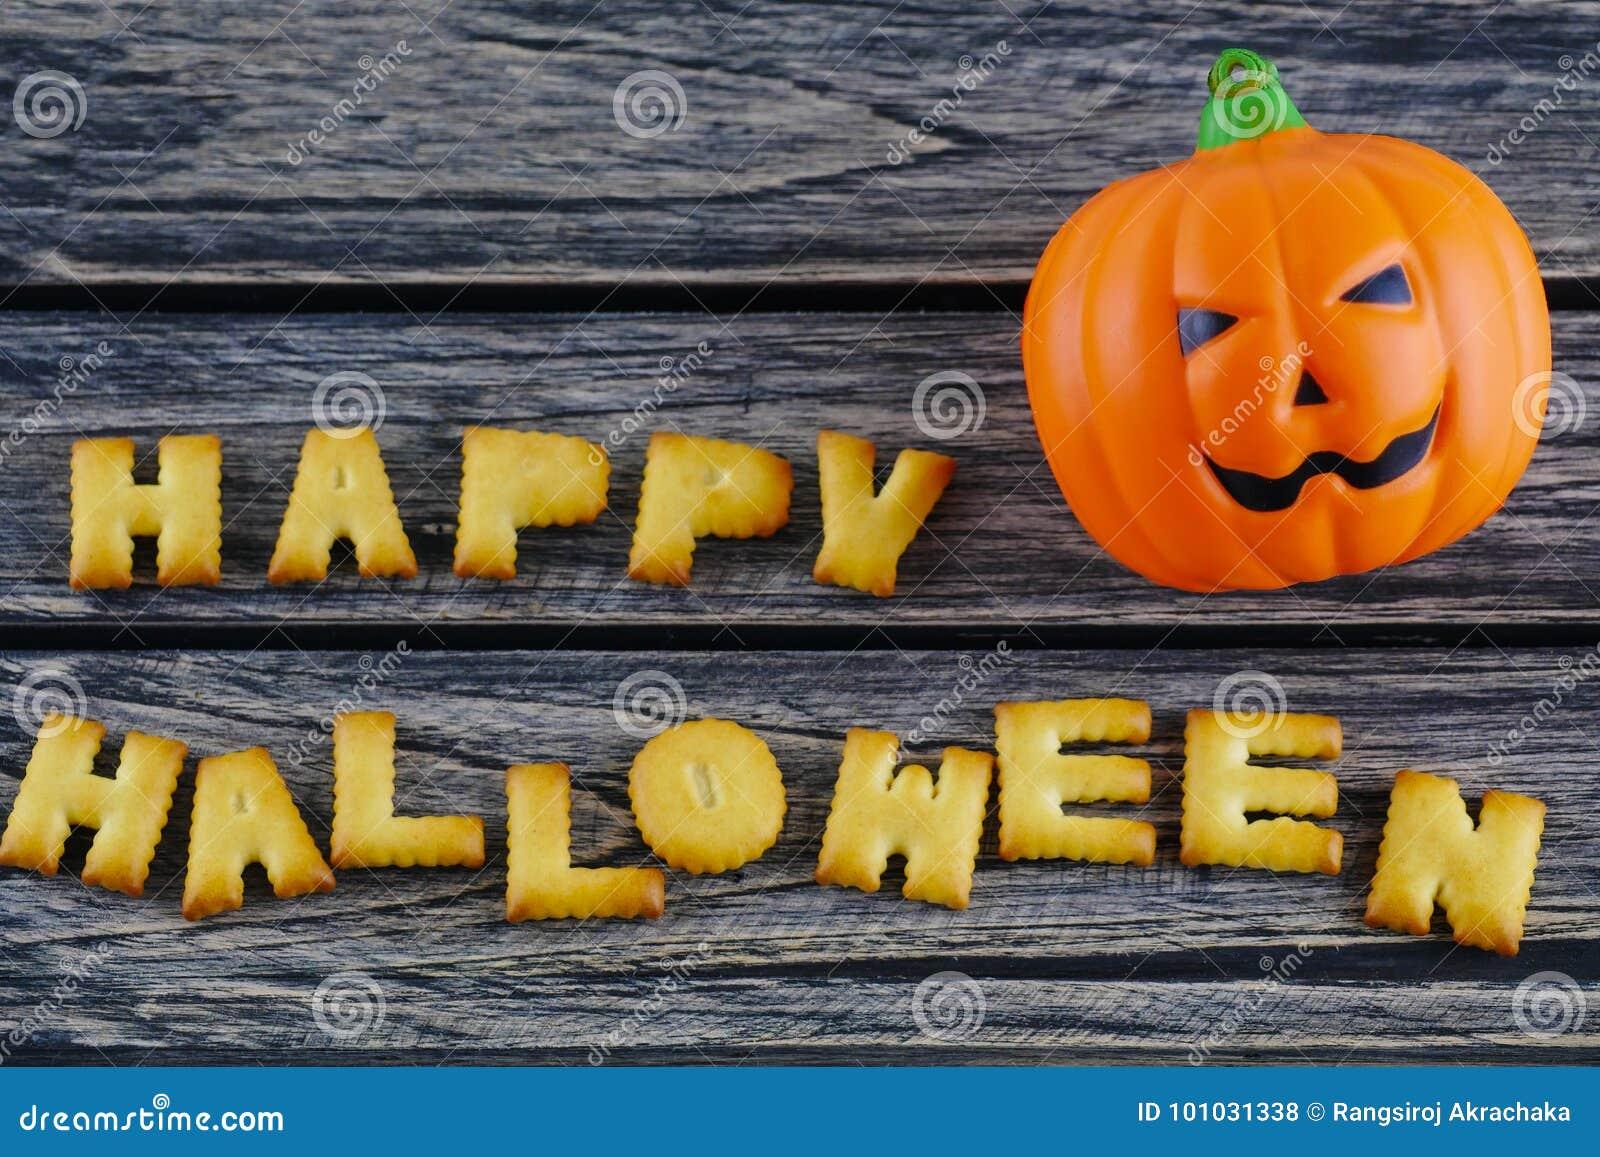 Happy Halloween words decoration with jack lantern pumpkin on wooden background